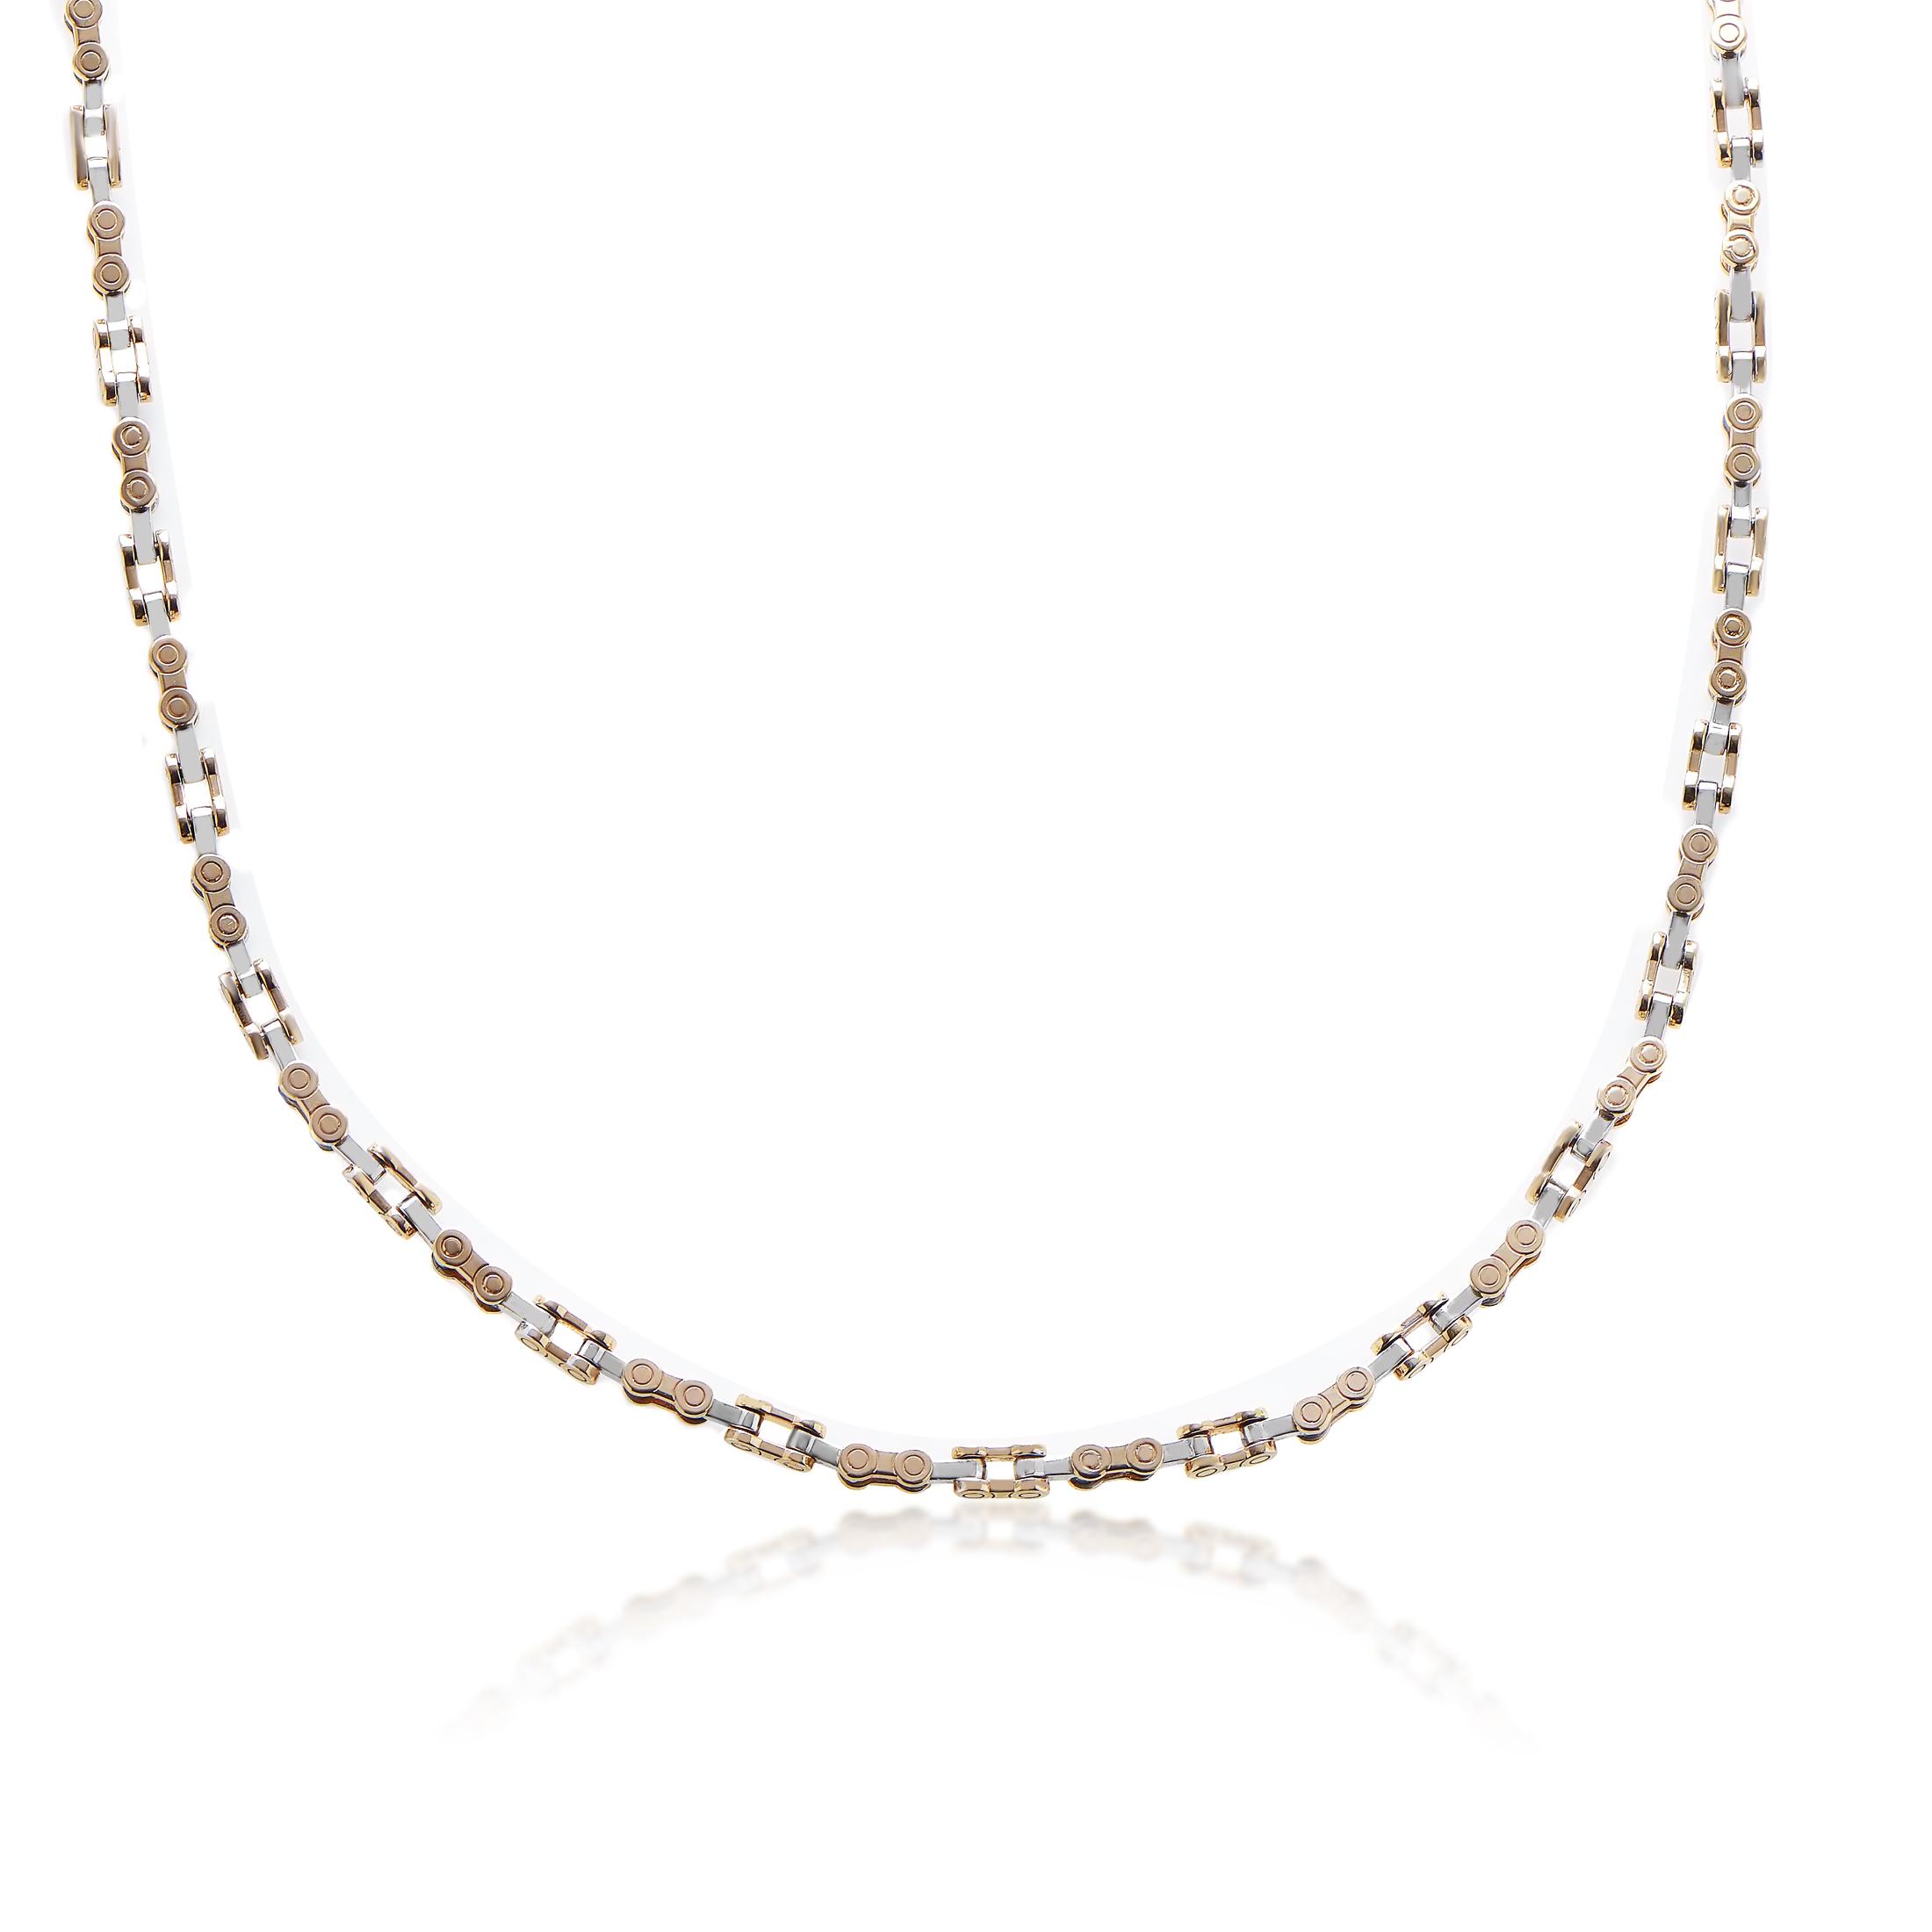 Baraka Women's 18K Multi-Tone Gold Chain Link Necklace